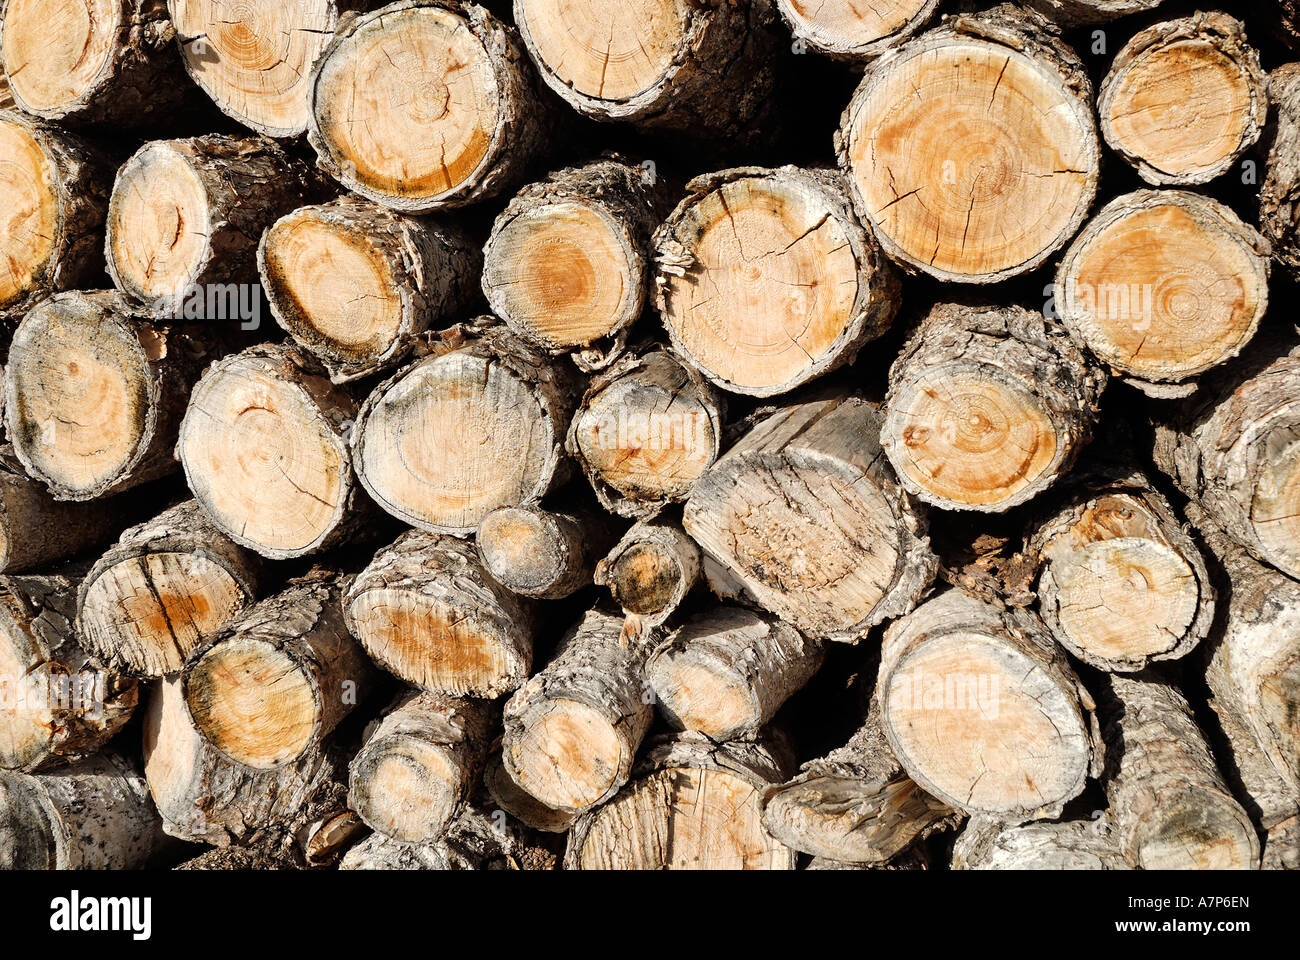 Nachwachsender Rohstoff Holz renewable resource wood - Stock Image